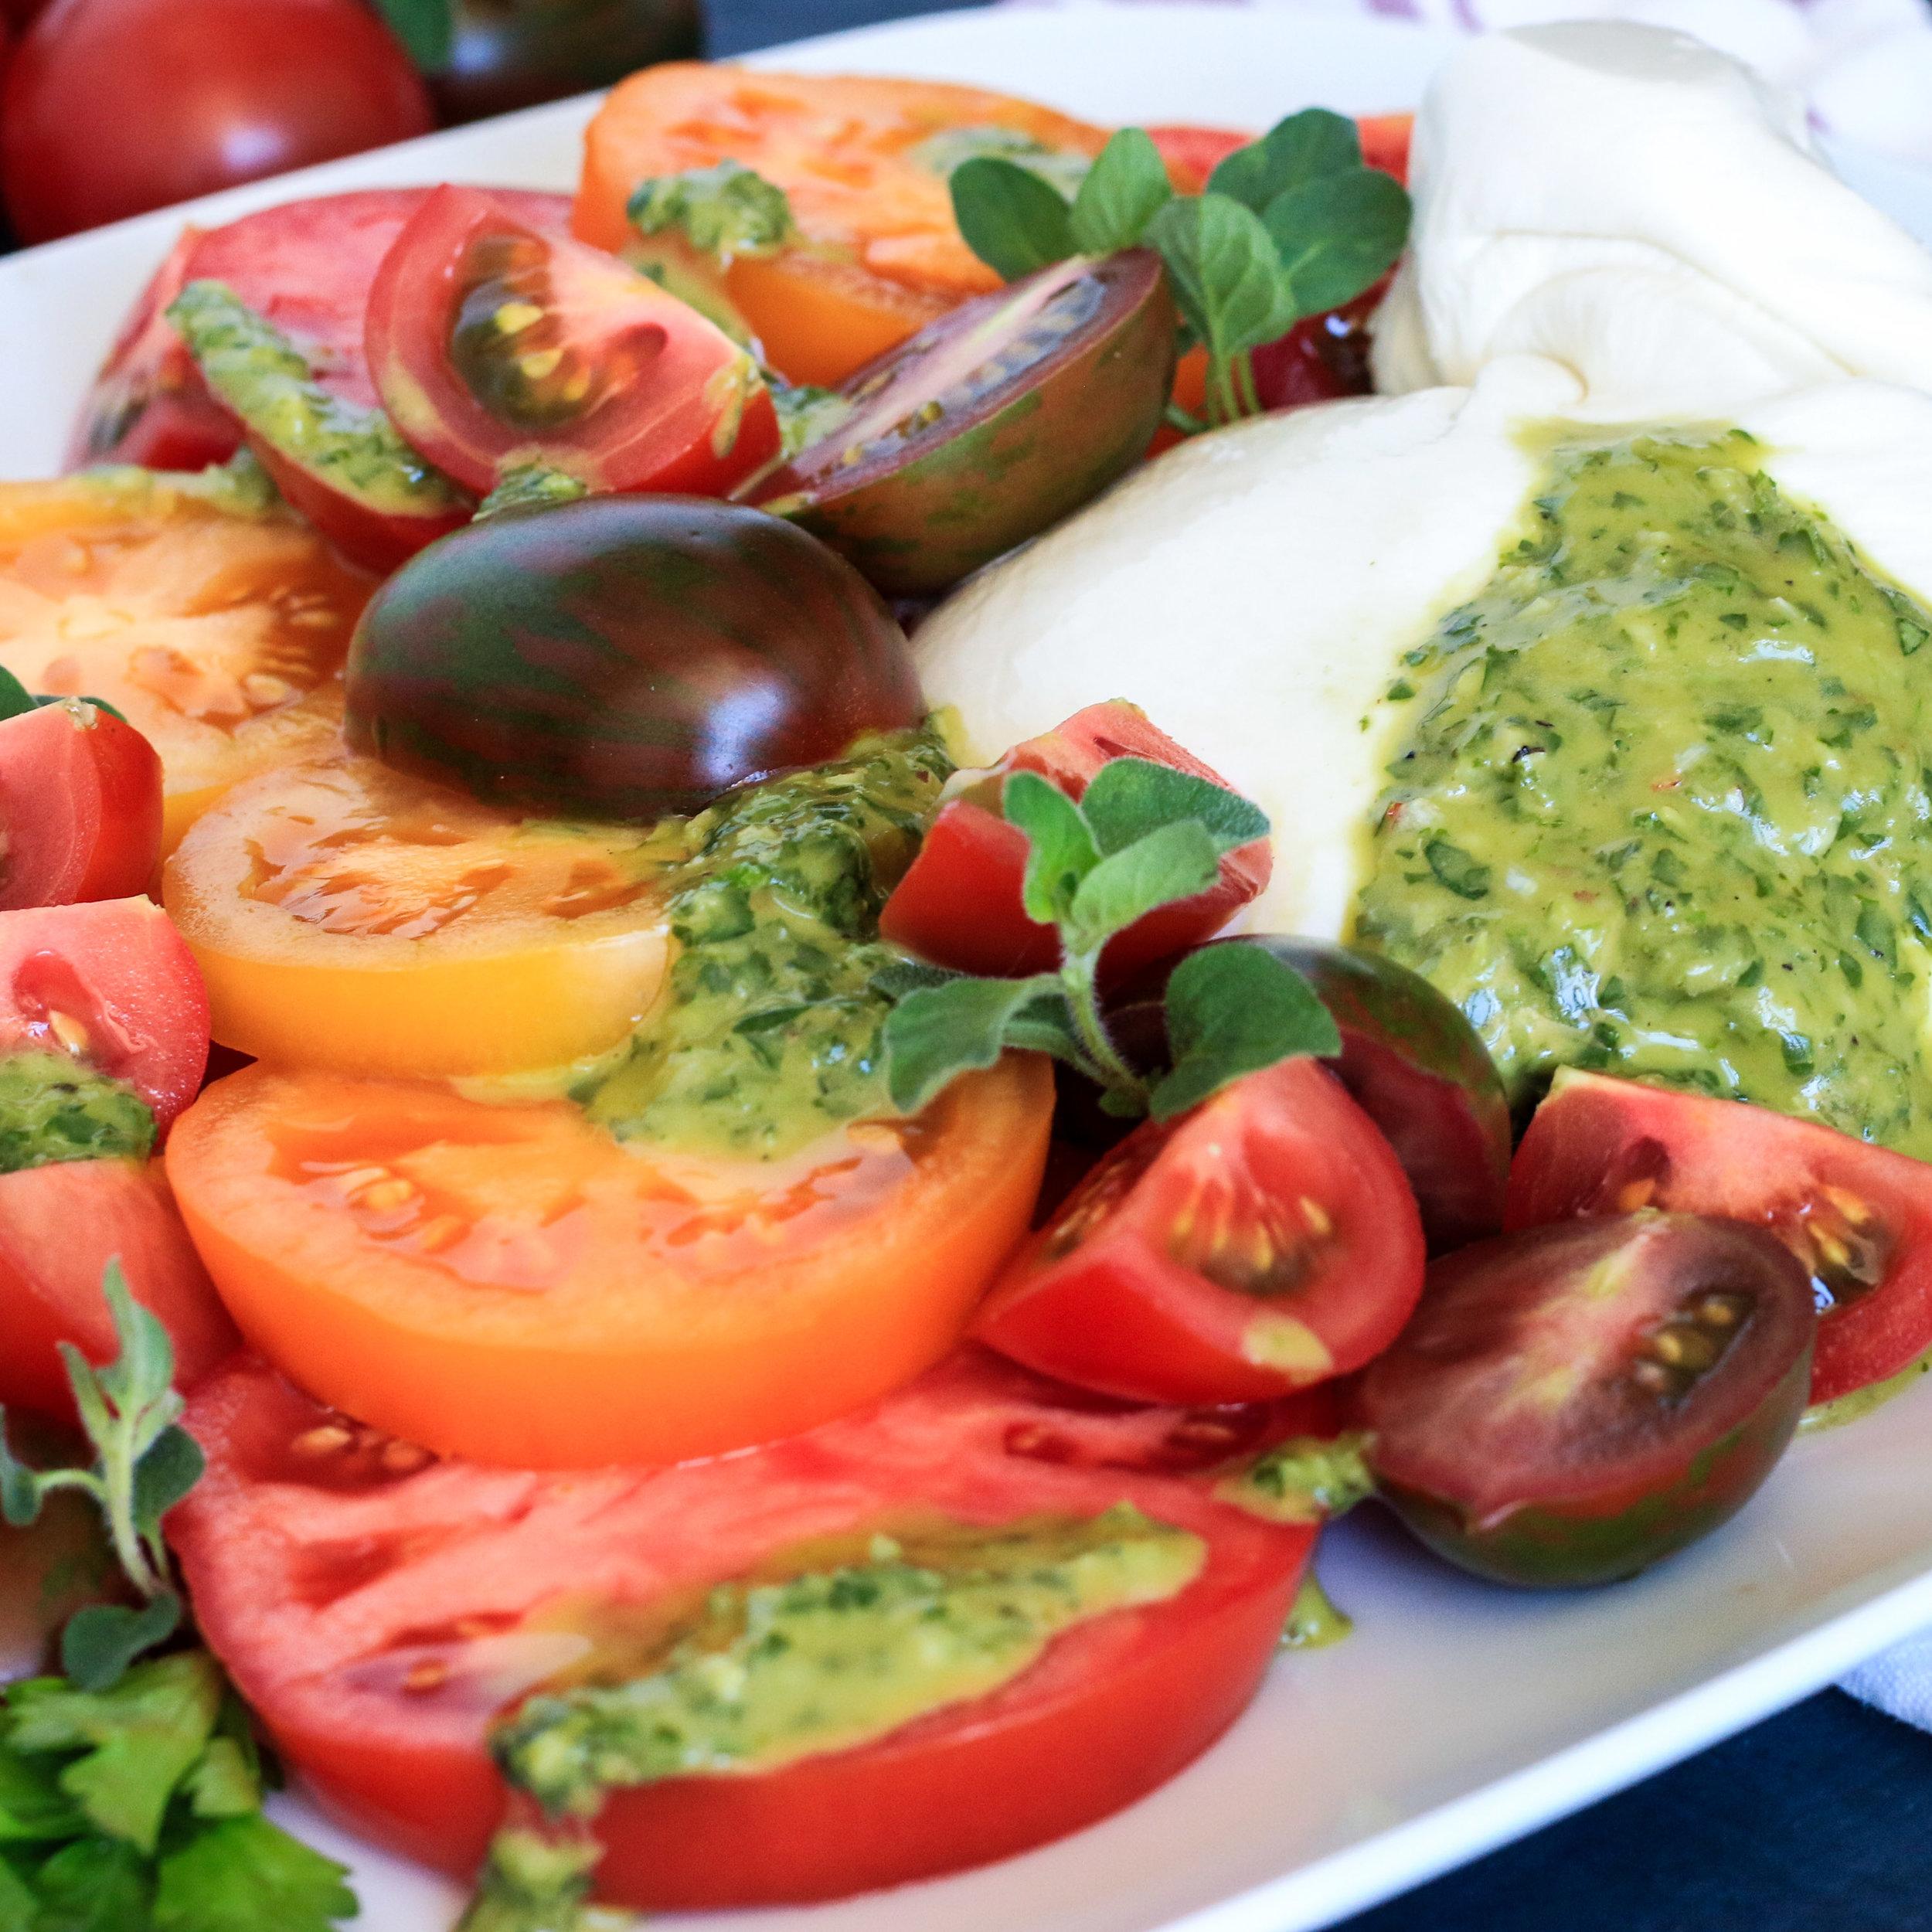 Burrata+Salad+with+Chimichurri+Dressing-1.jpg